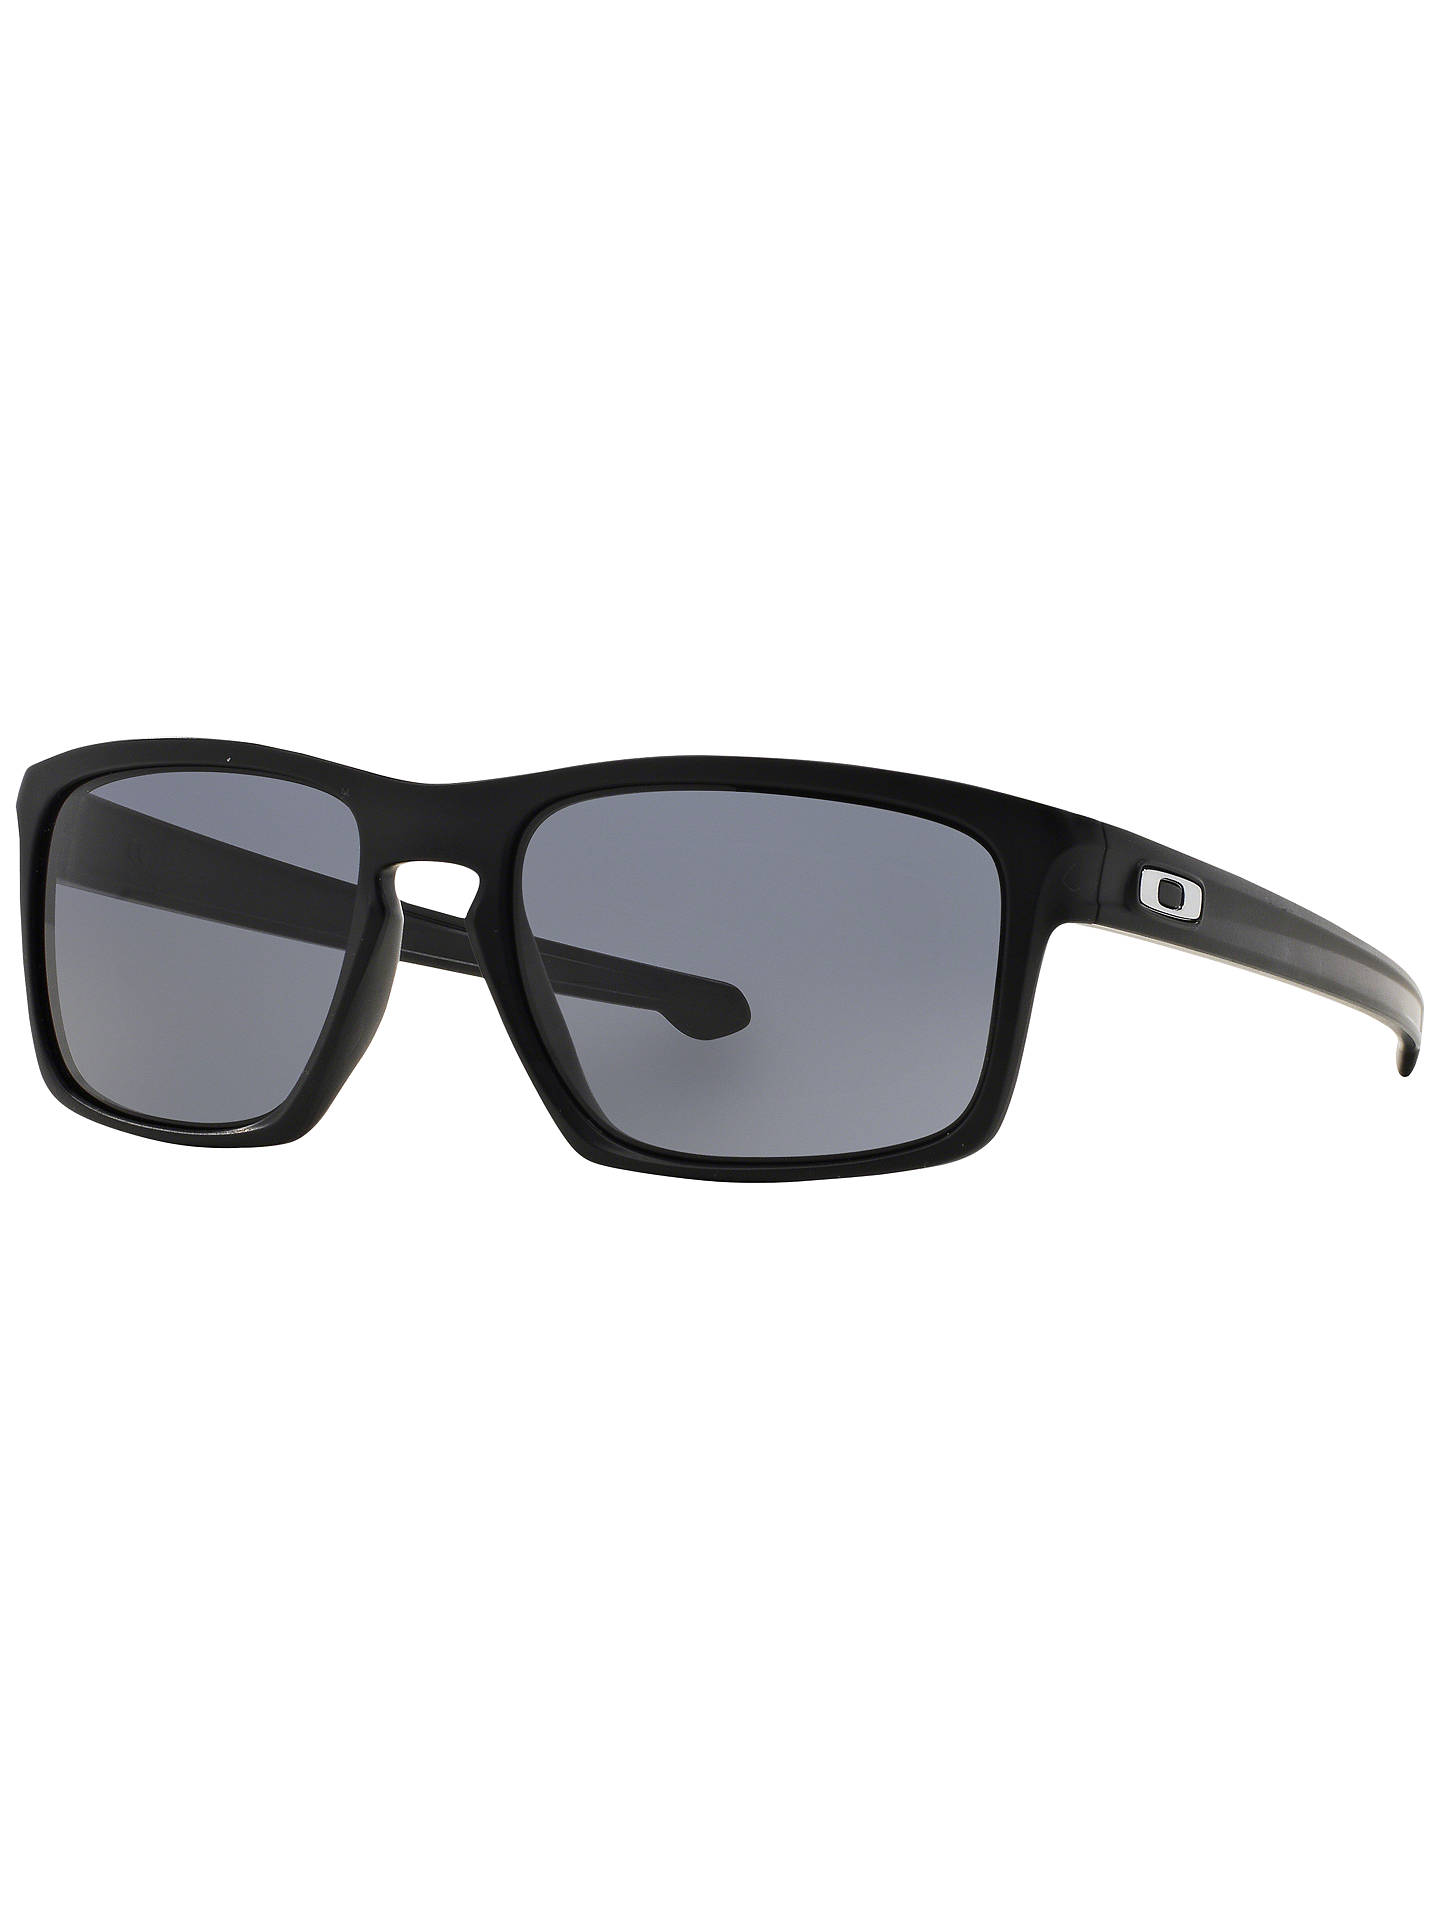 26ca3a6106b3b Oakley OO9262 Sliver Rectangular Sunglasses at John Lewis   Partners